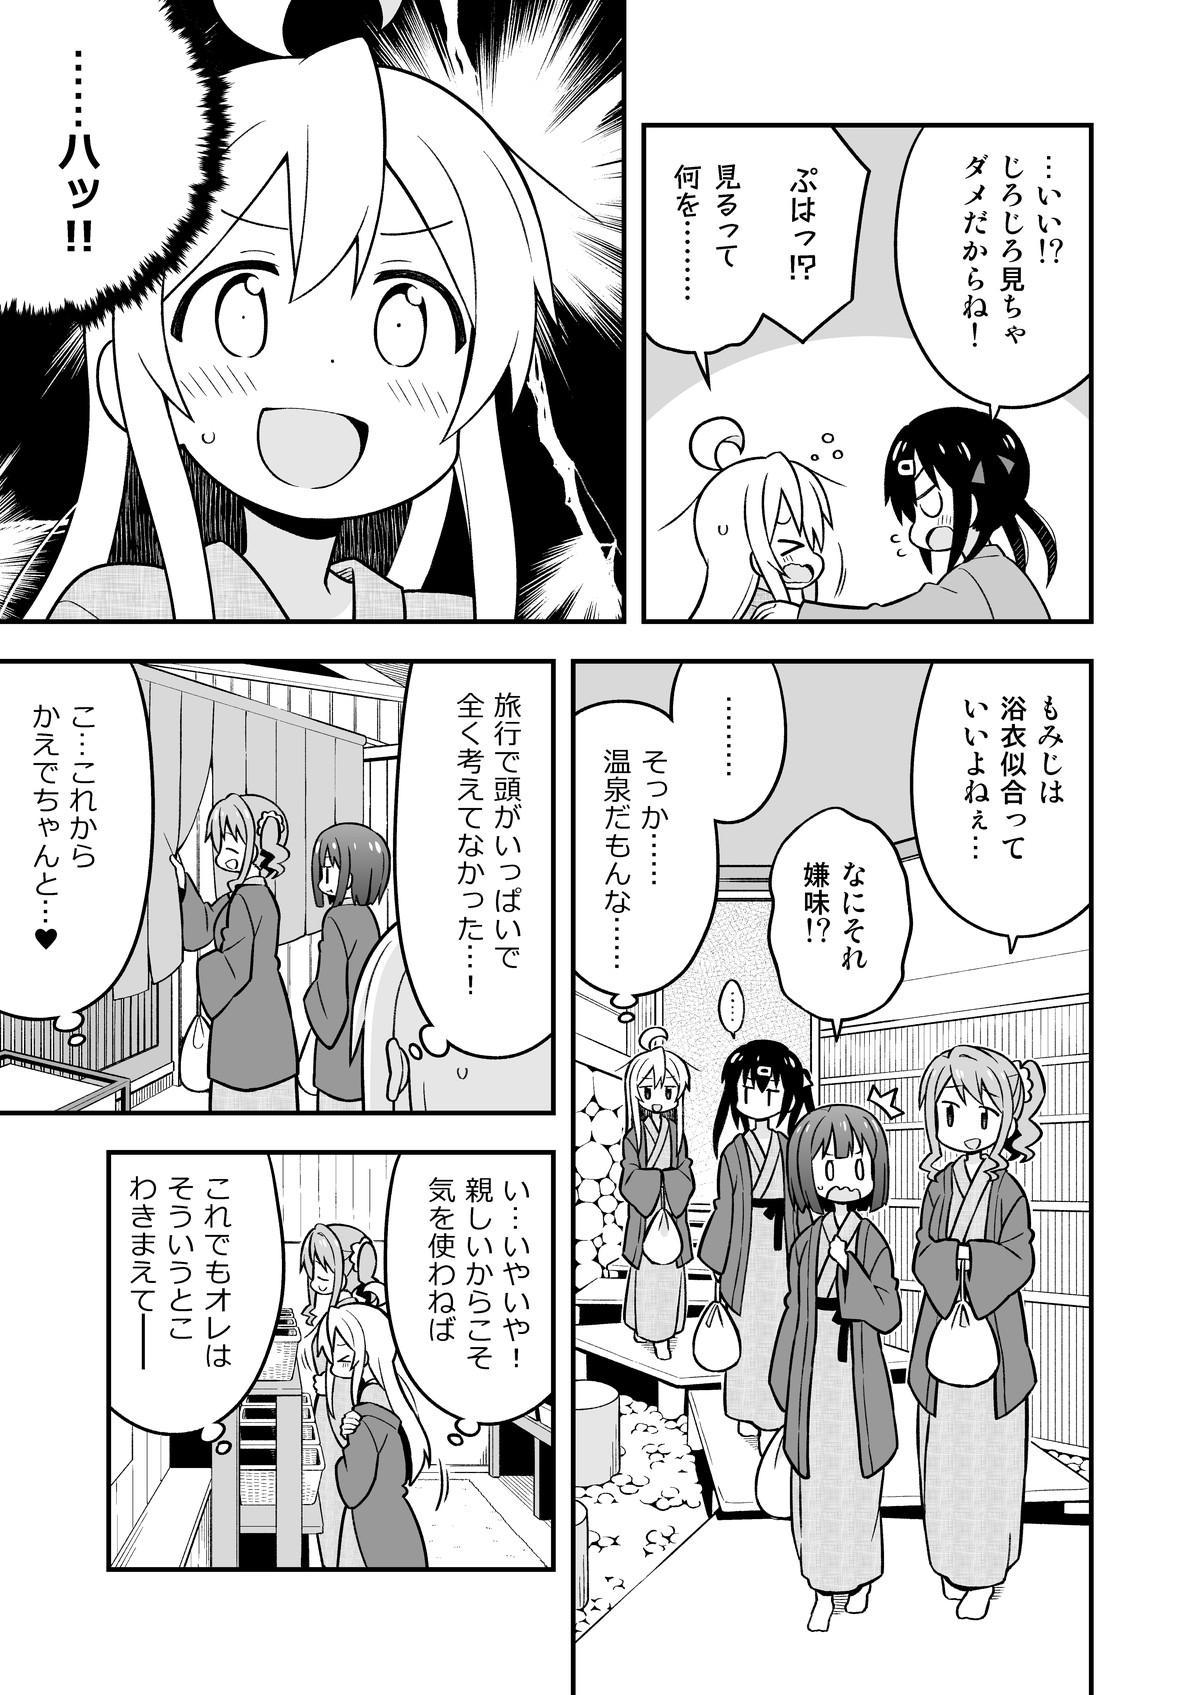 Onii-chan wa Oshimai! 6 19